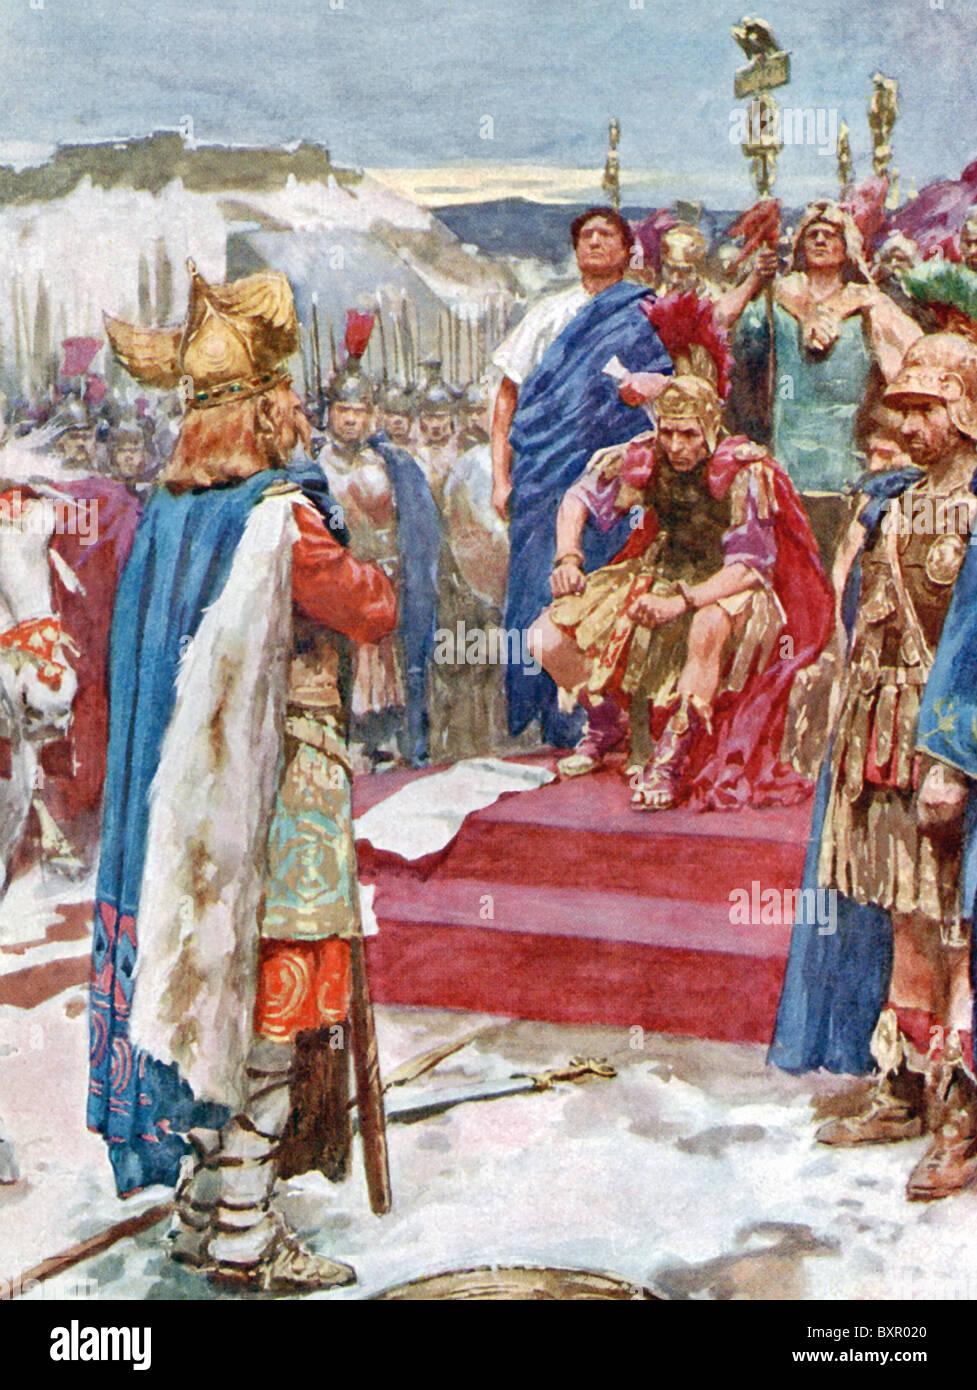 Gallic chieftain Vercingetorix officially surrenders his sword and himself to Julius Caesar. - Stock Image